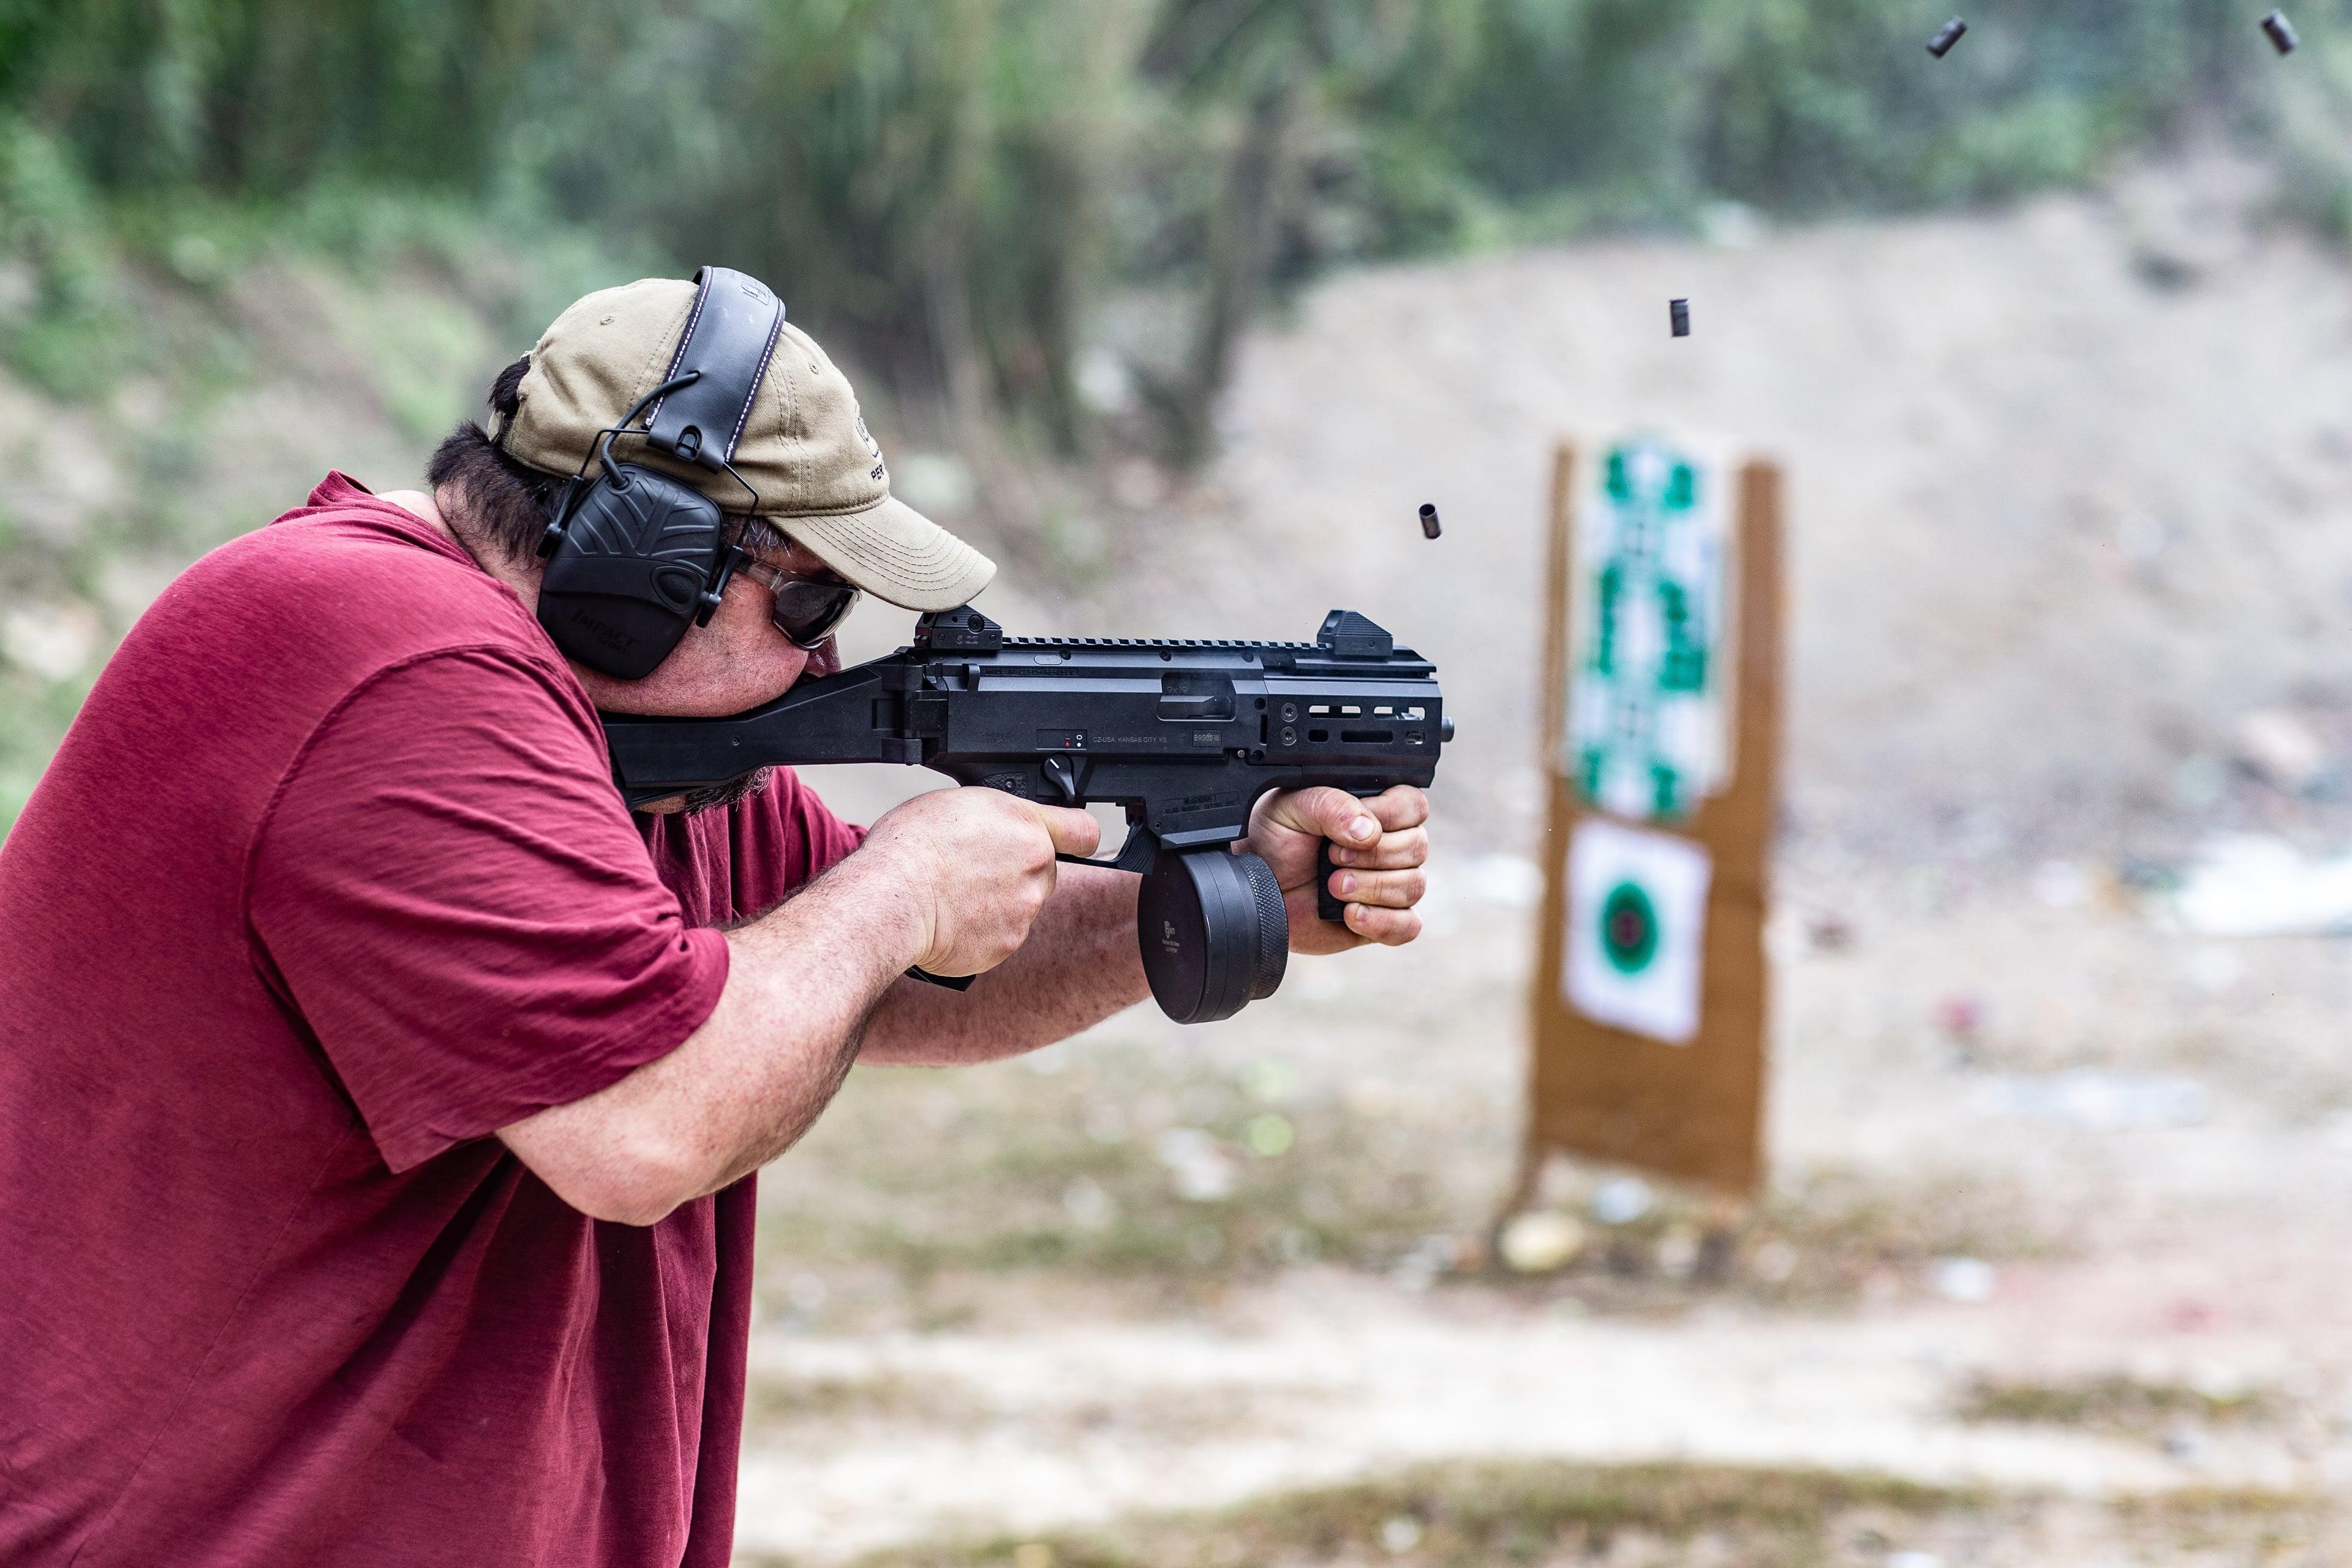 Carlos from CW Gunwerks running a CZ Scorpion EVO submachine gun